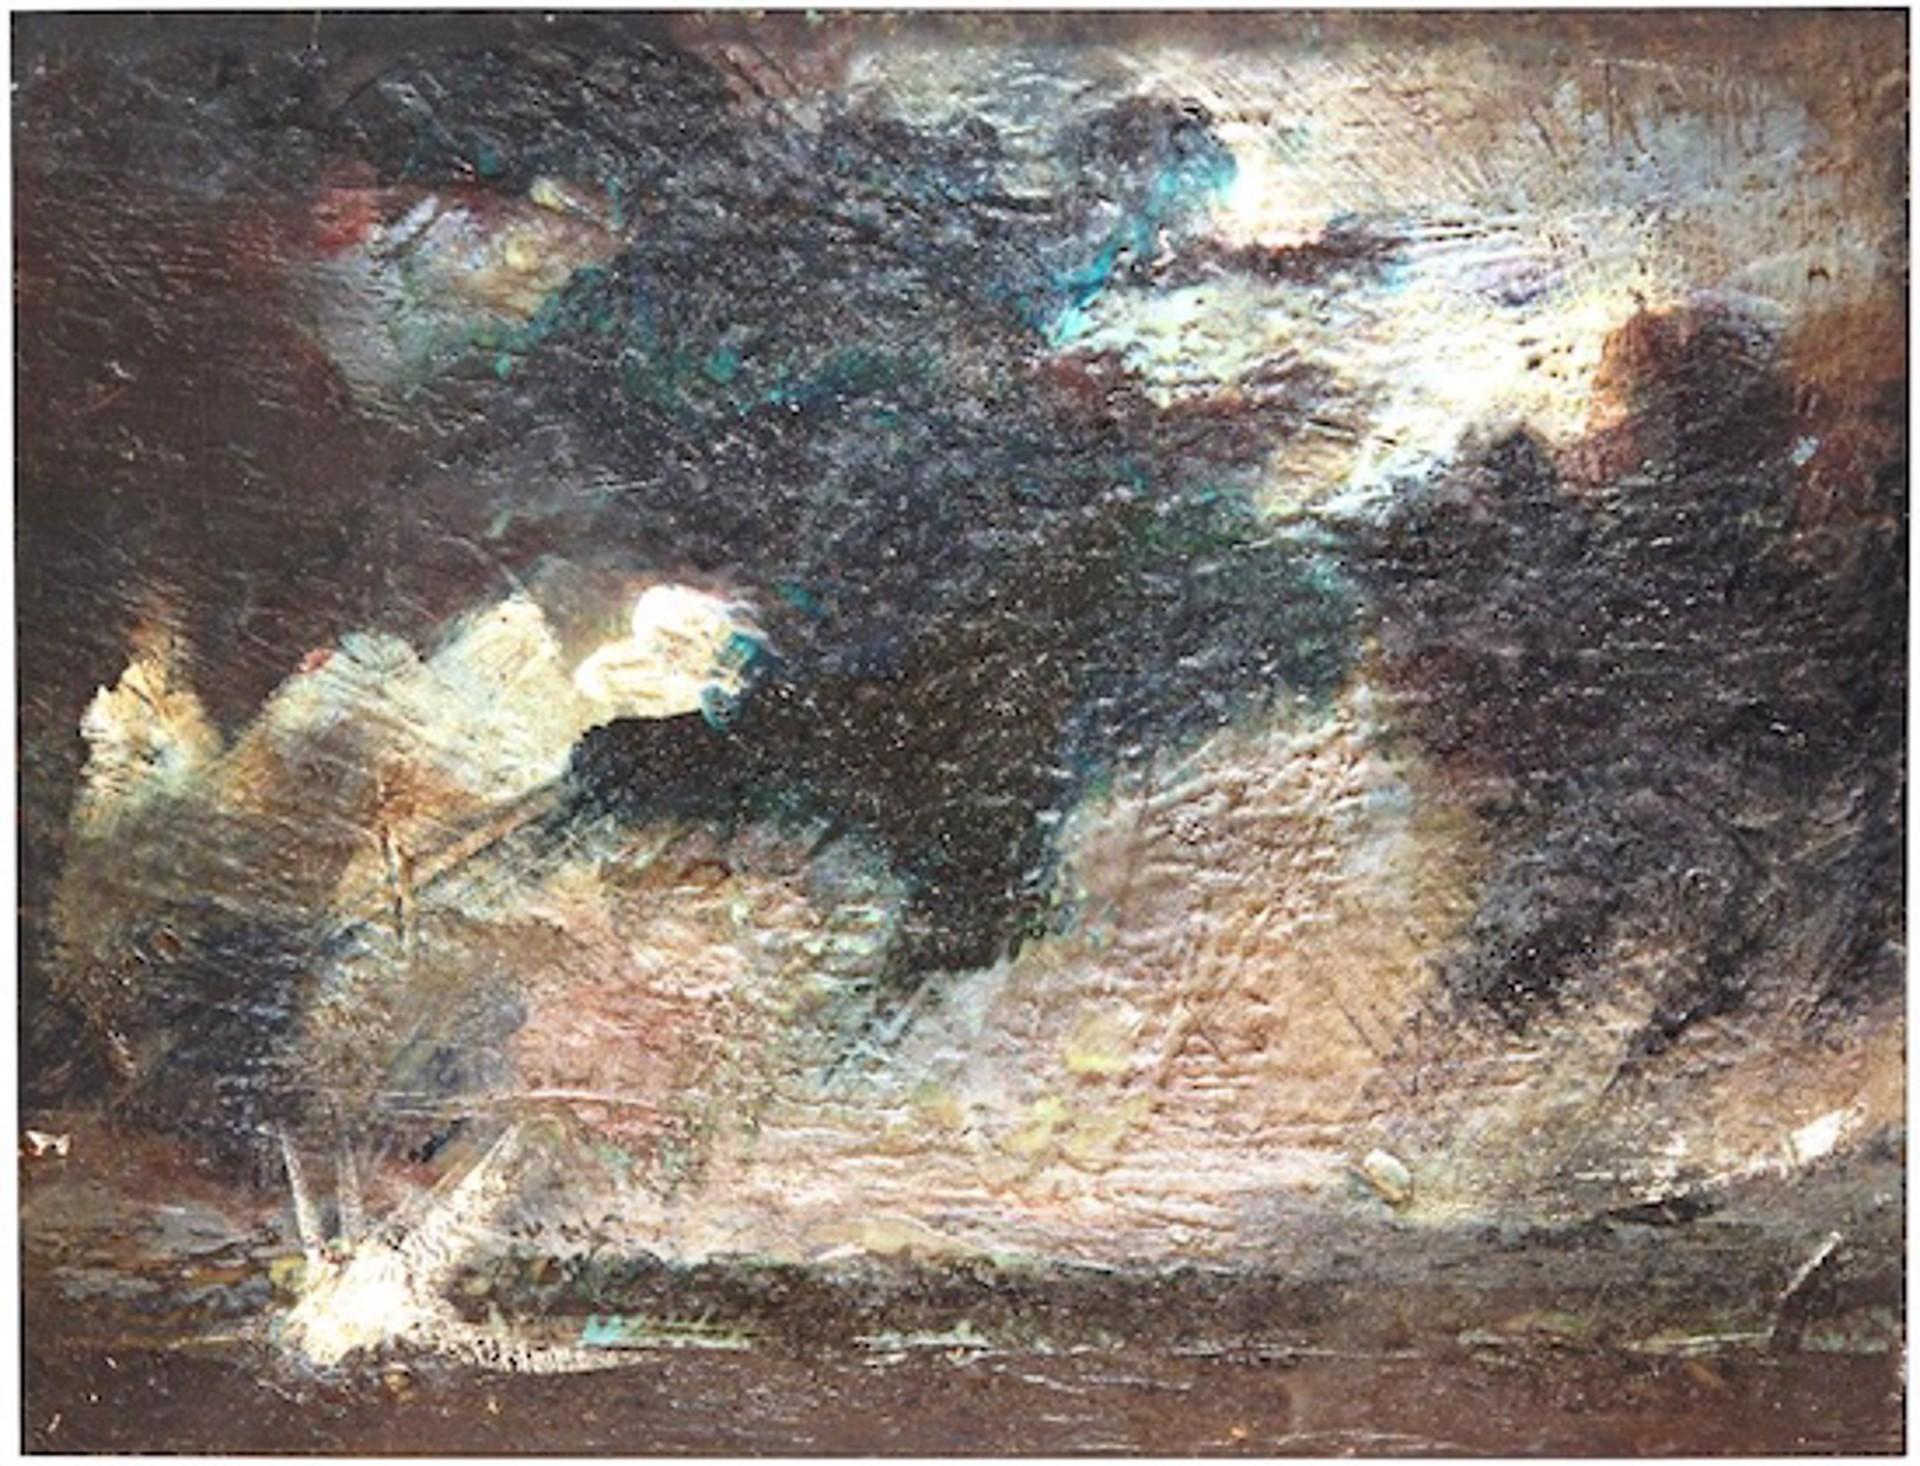 Marine Nightscape I by Macuria Montolanez